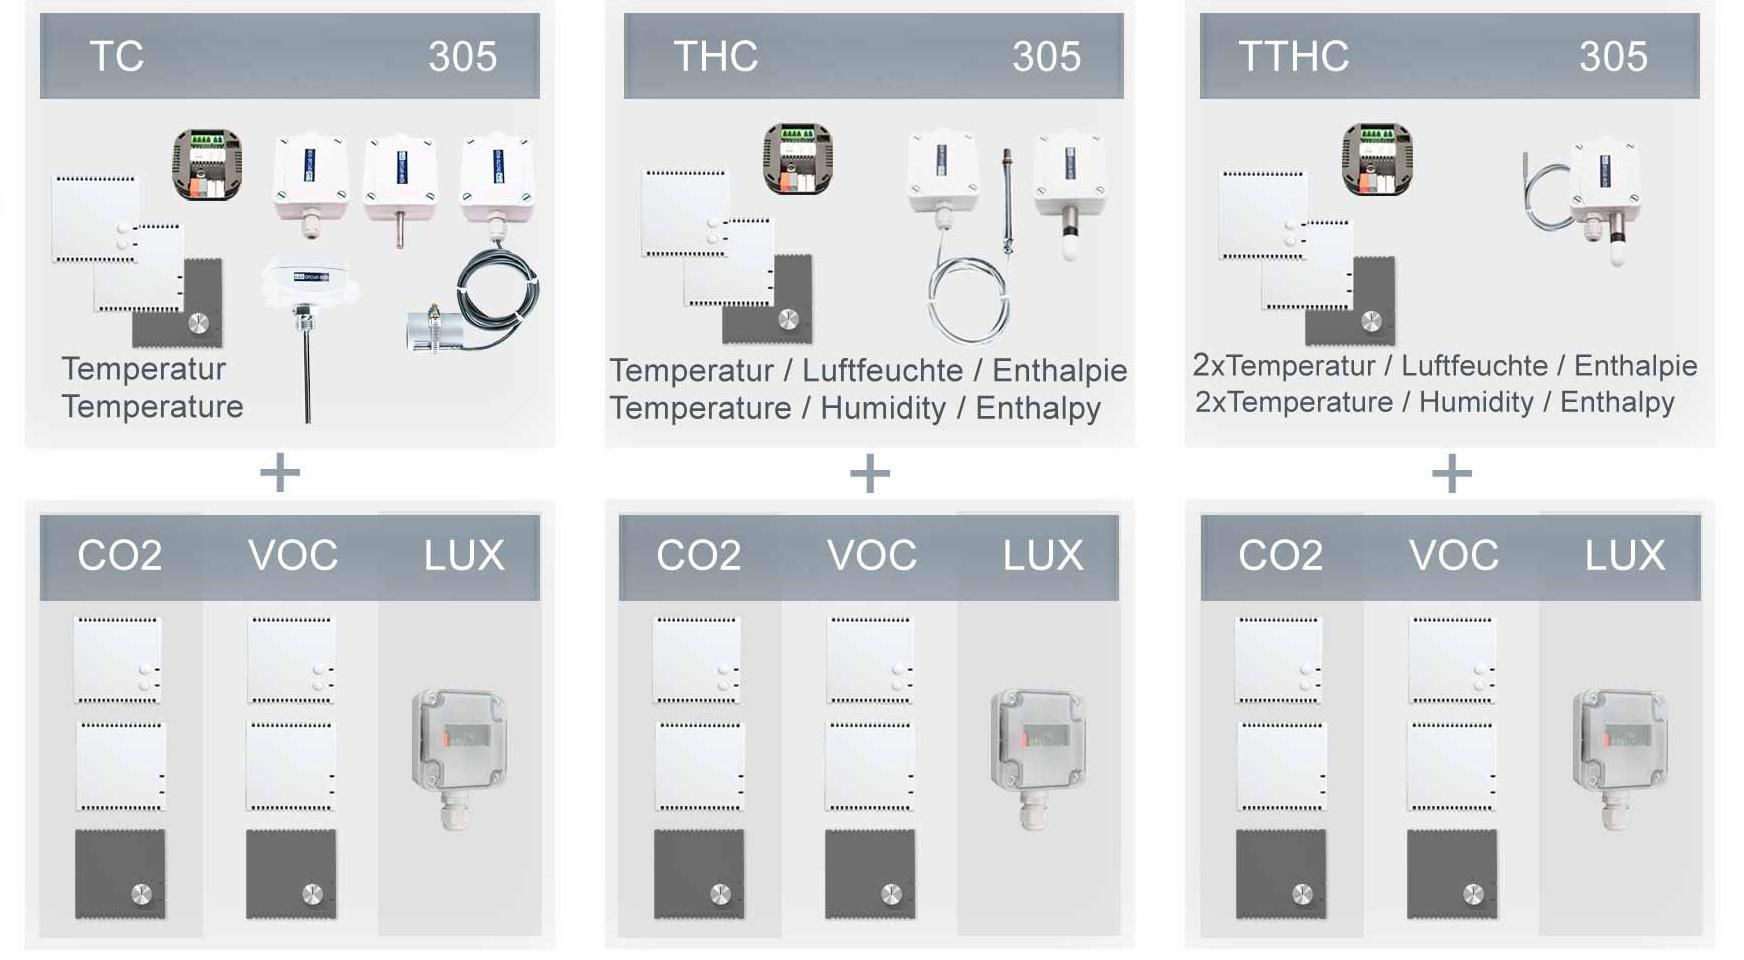 HVAC sensors 305 from Arcus-eds